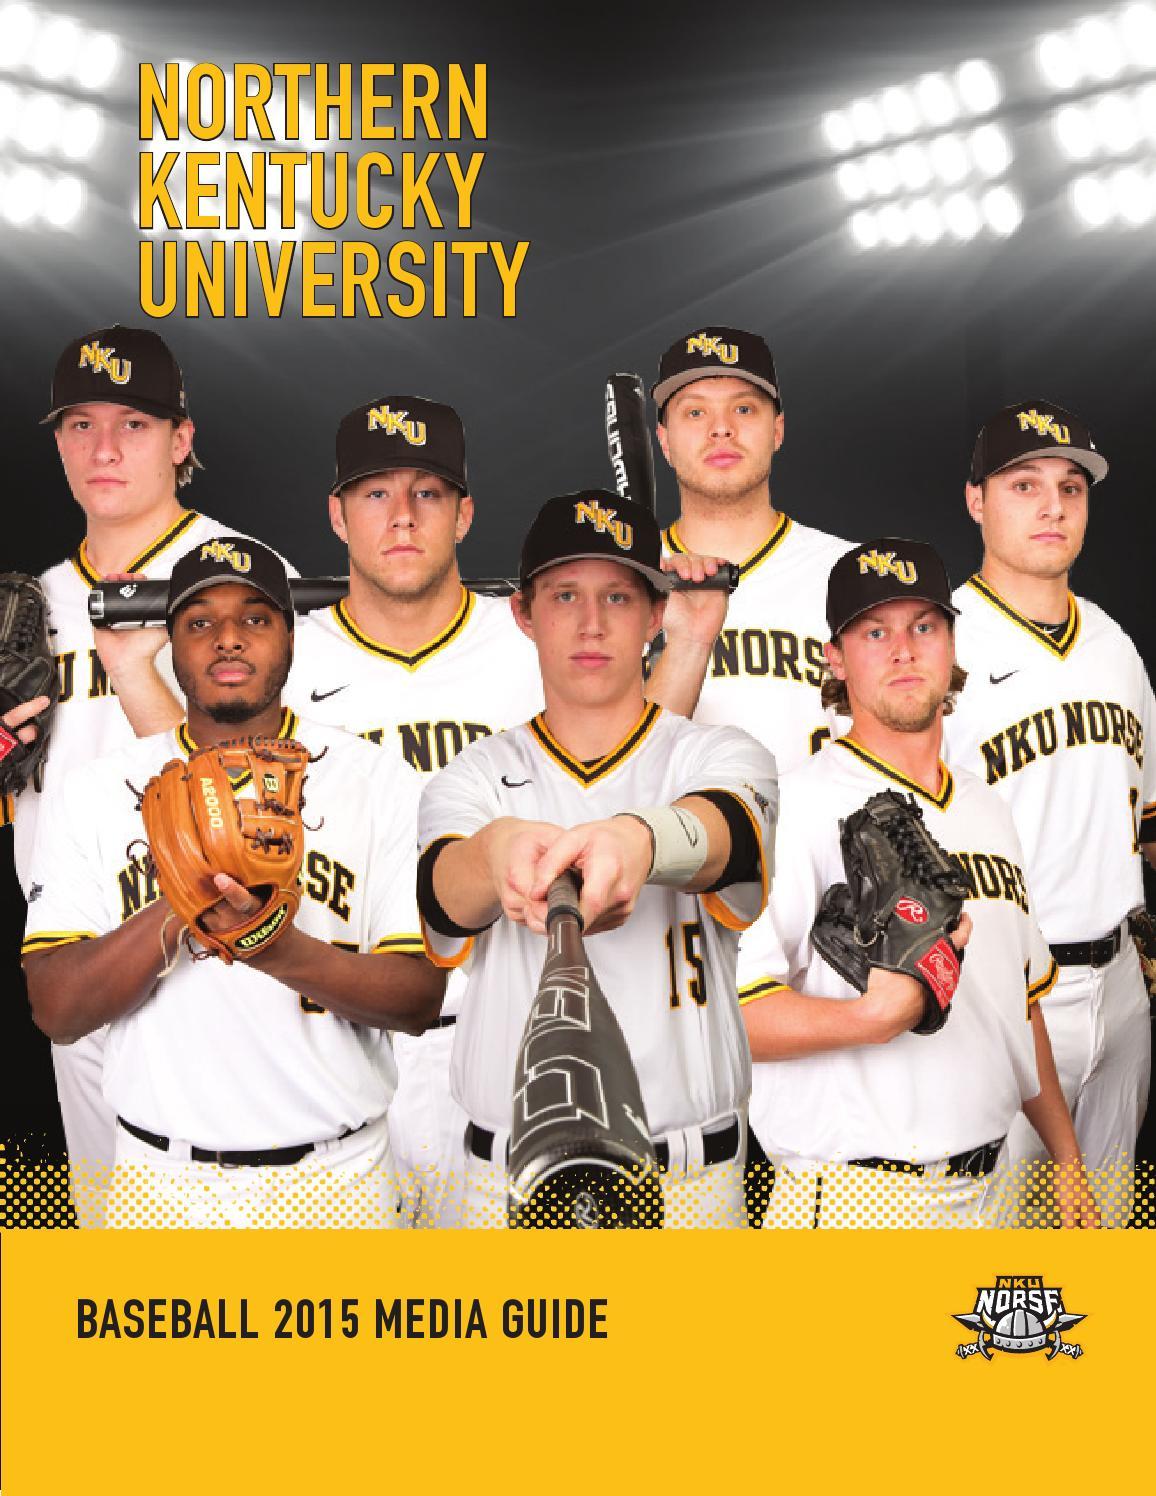 new arrivals 17ff7 e04bd 2015 Northern Kentucky University Baseball Media Guide by ...